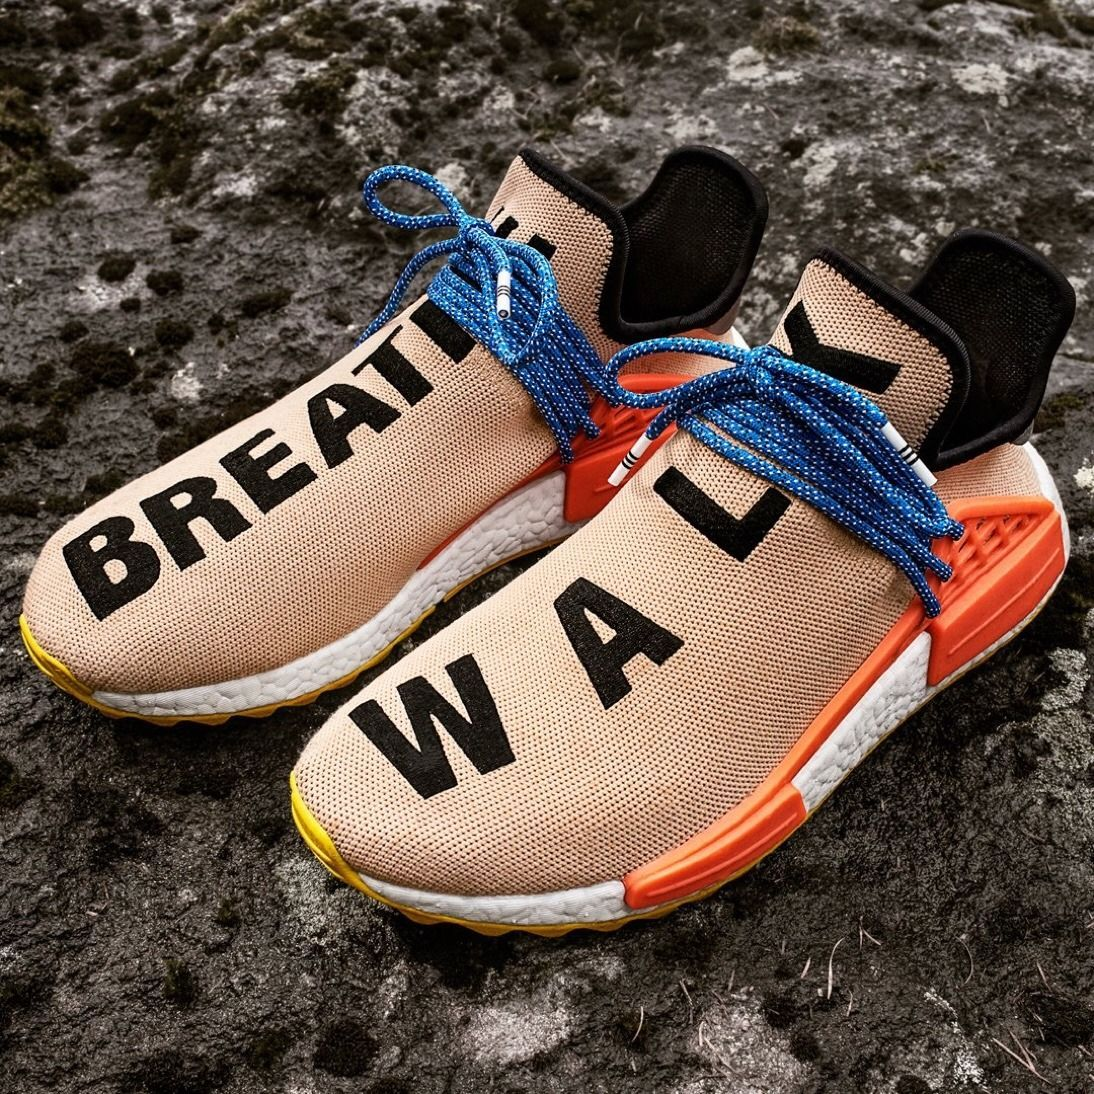 promo code c8463 6e812 Adidas NMD x Pharrell PW Human Race by blog.sneakerando.com sneakers  sneakernews StreetStyle Kicks adidas nike vans newbalance puma ADIDAS ASICS  CONVERSE ...